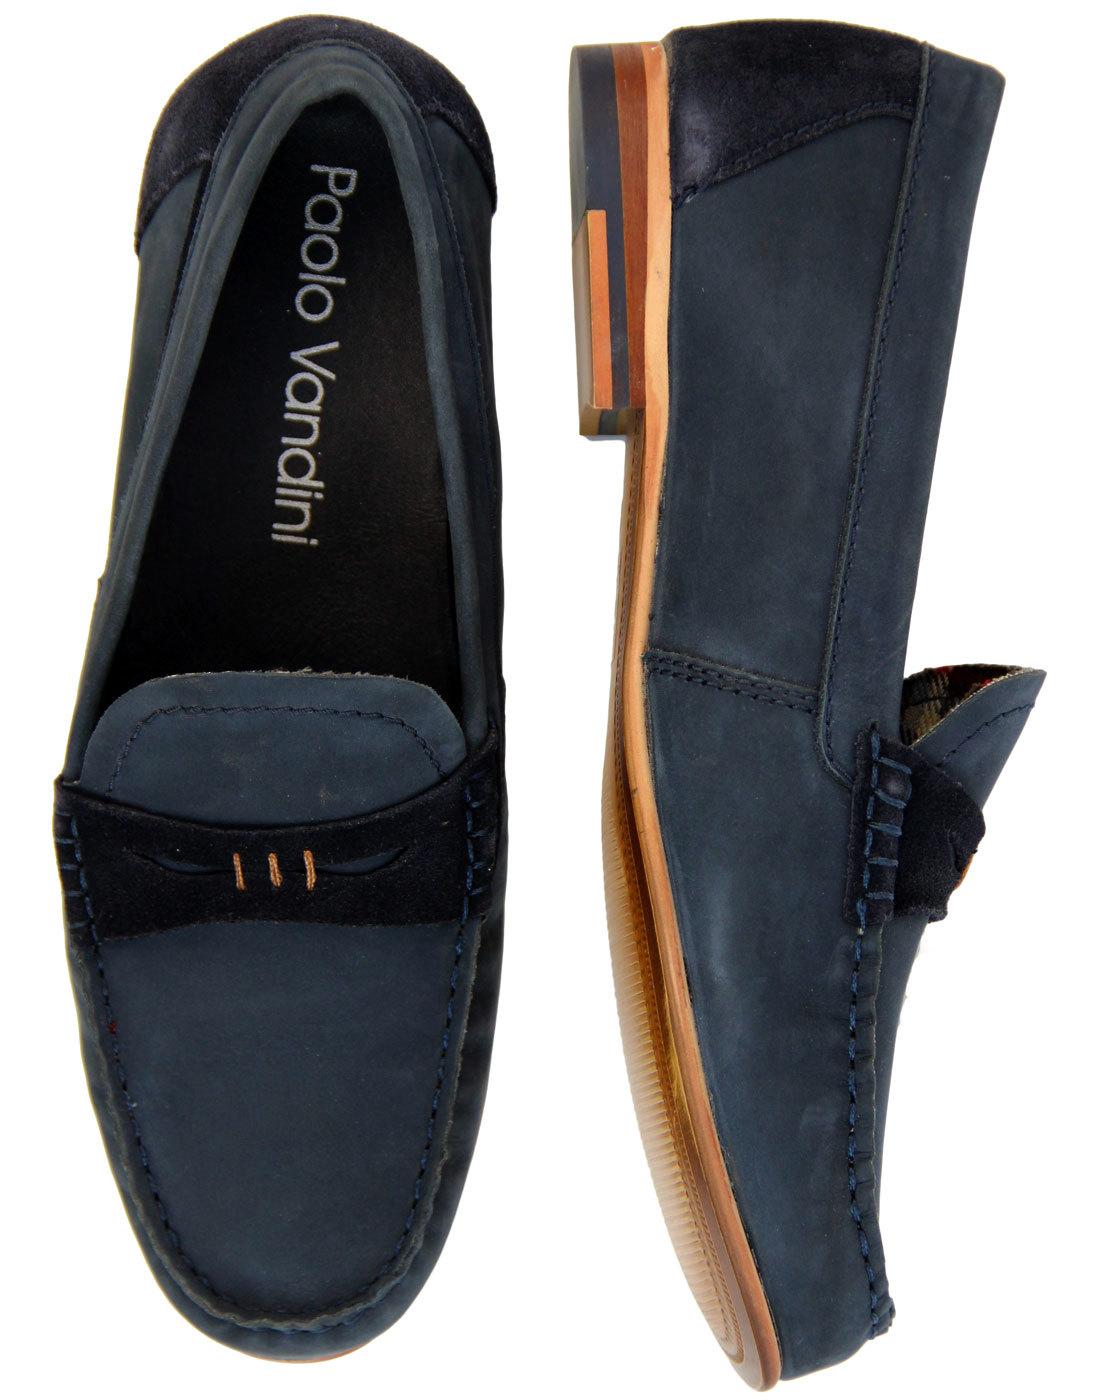 Rushil PAOLO VANDINI 60s Mod Nubuck Penny Loafers